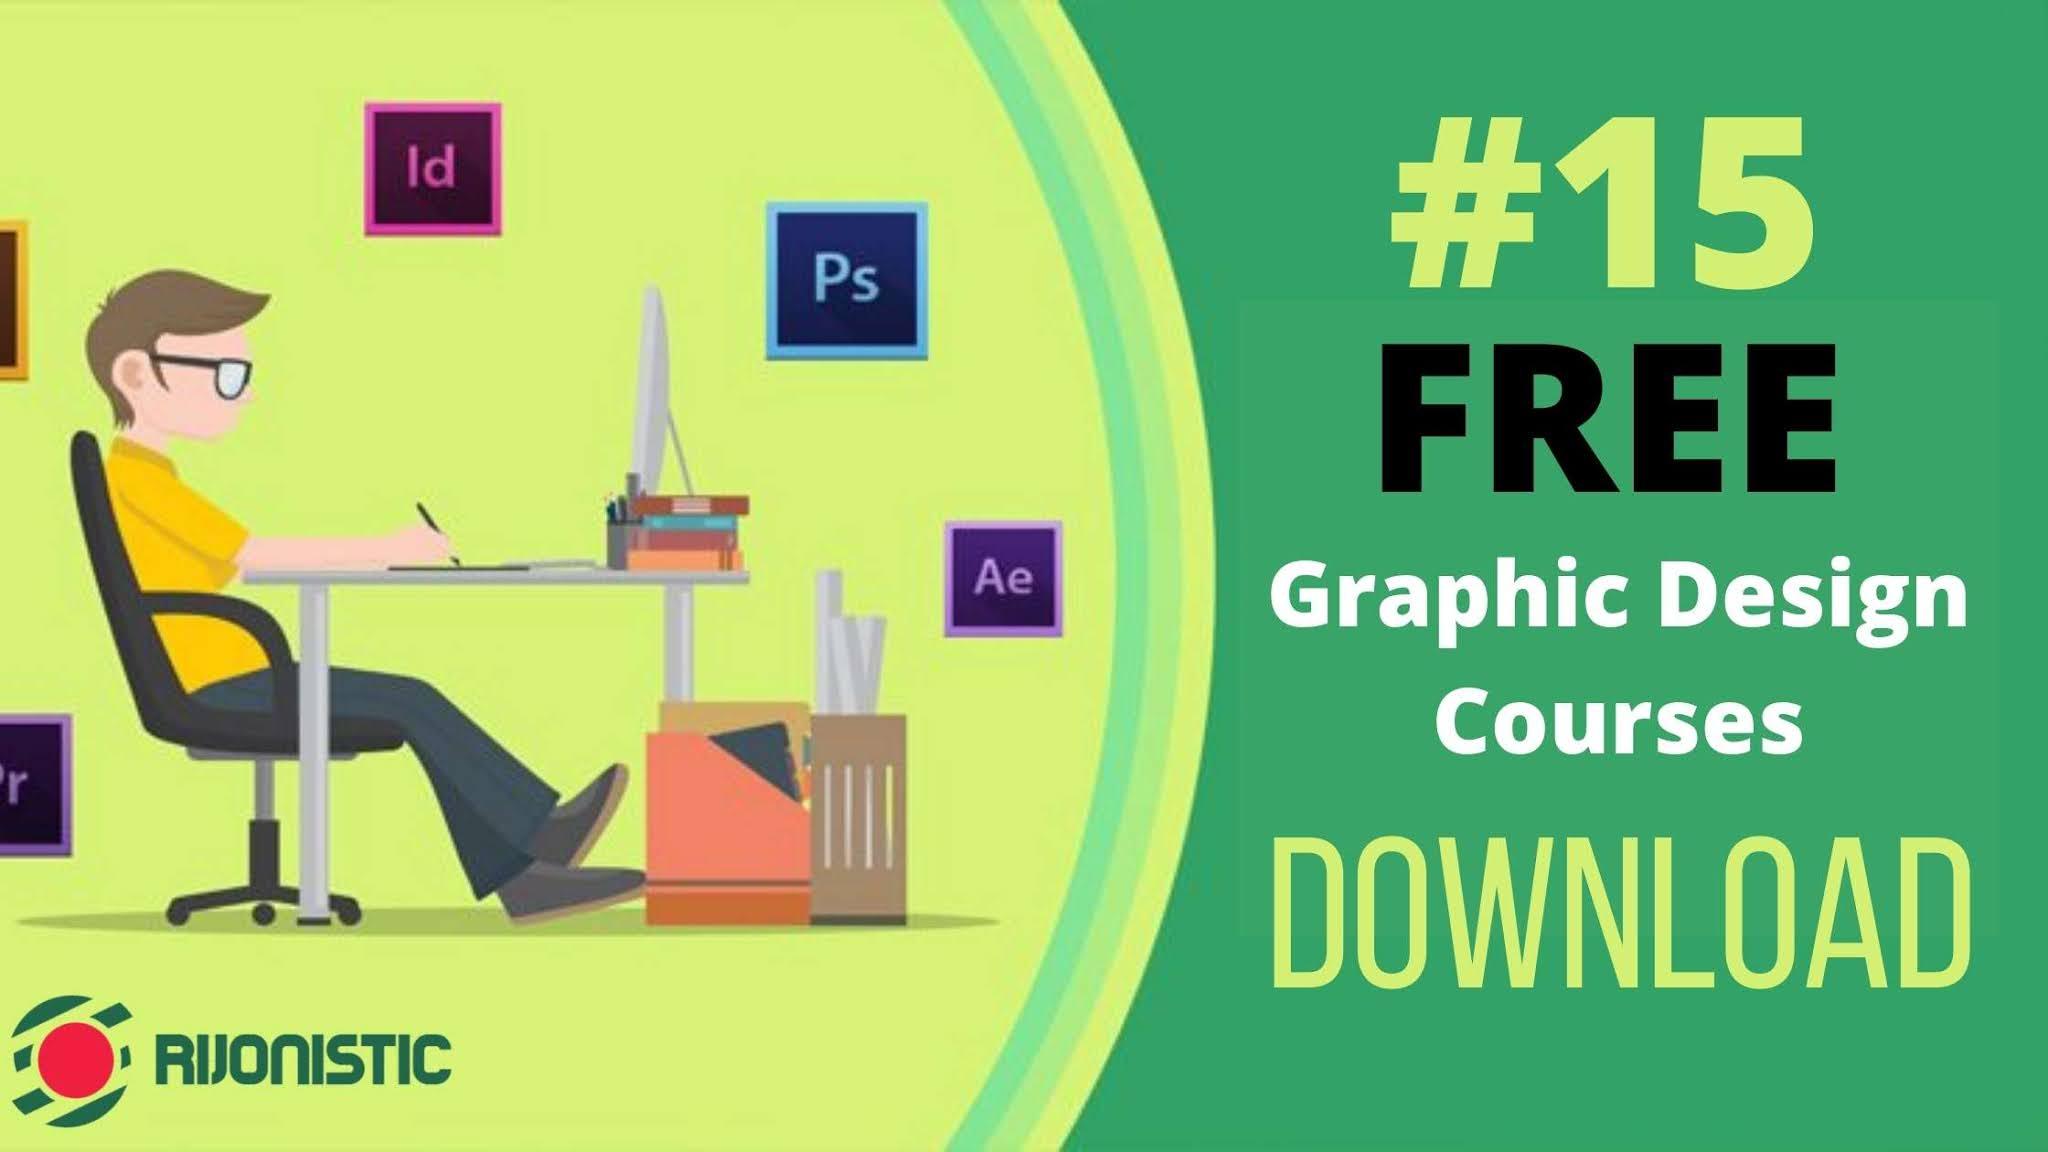 Graphic Design Course, Graphic Design 2020, Free Graphic Design Course Download, Graphic Designing, Learn Graphic Design,